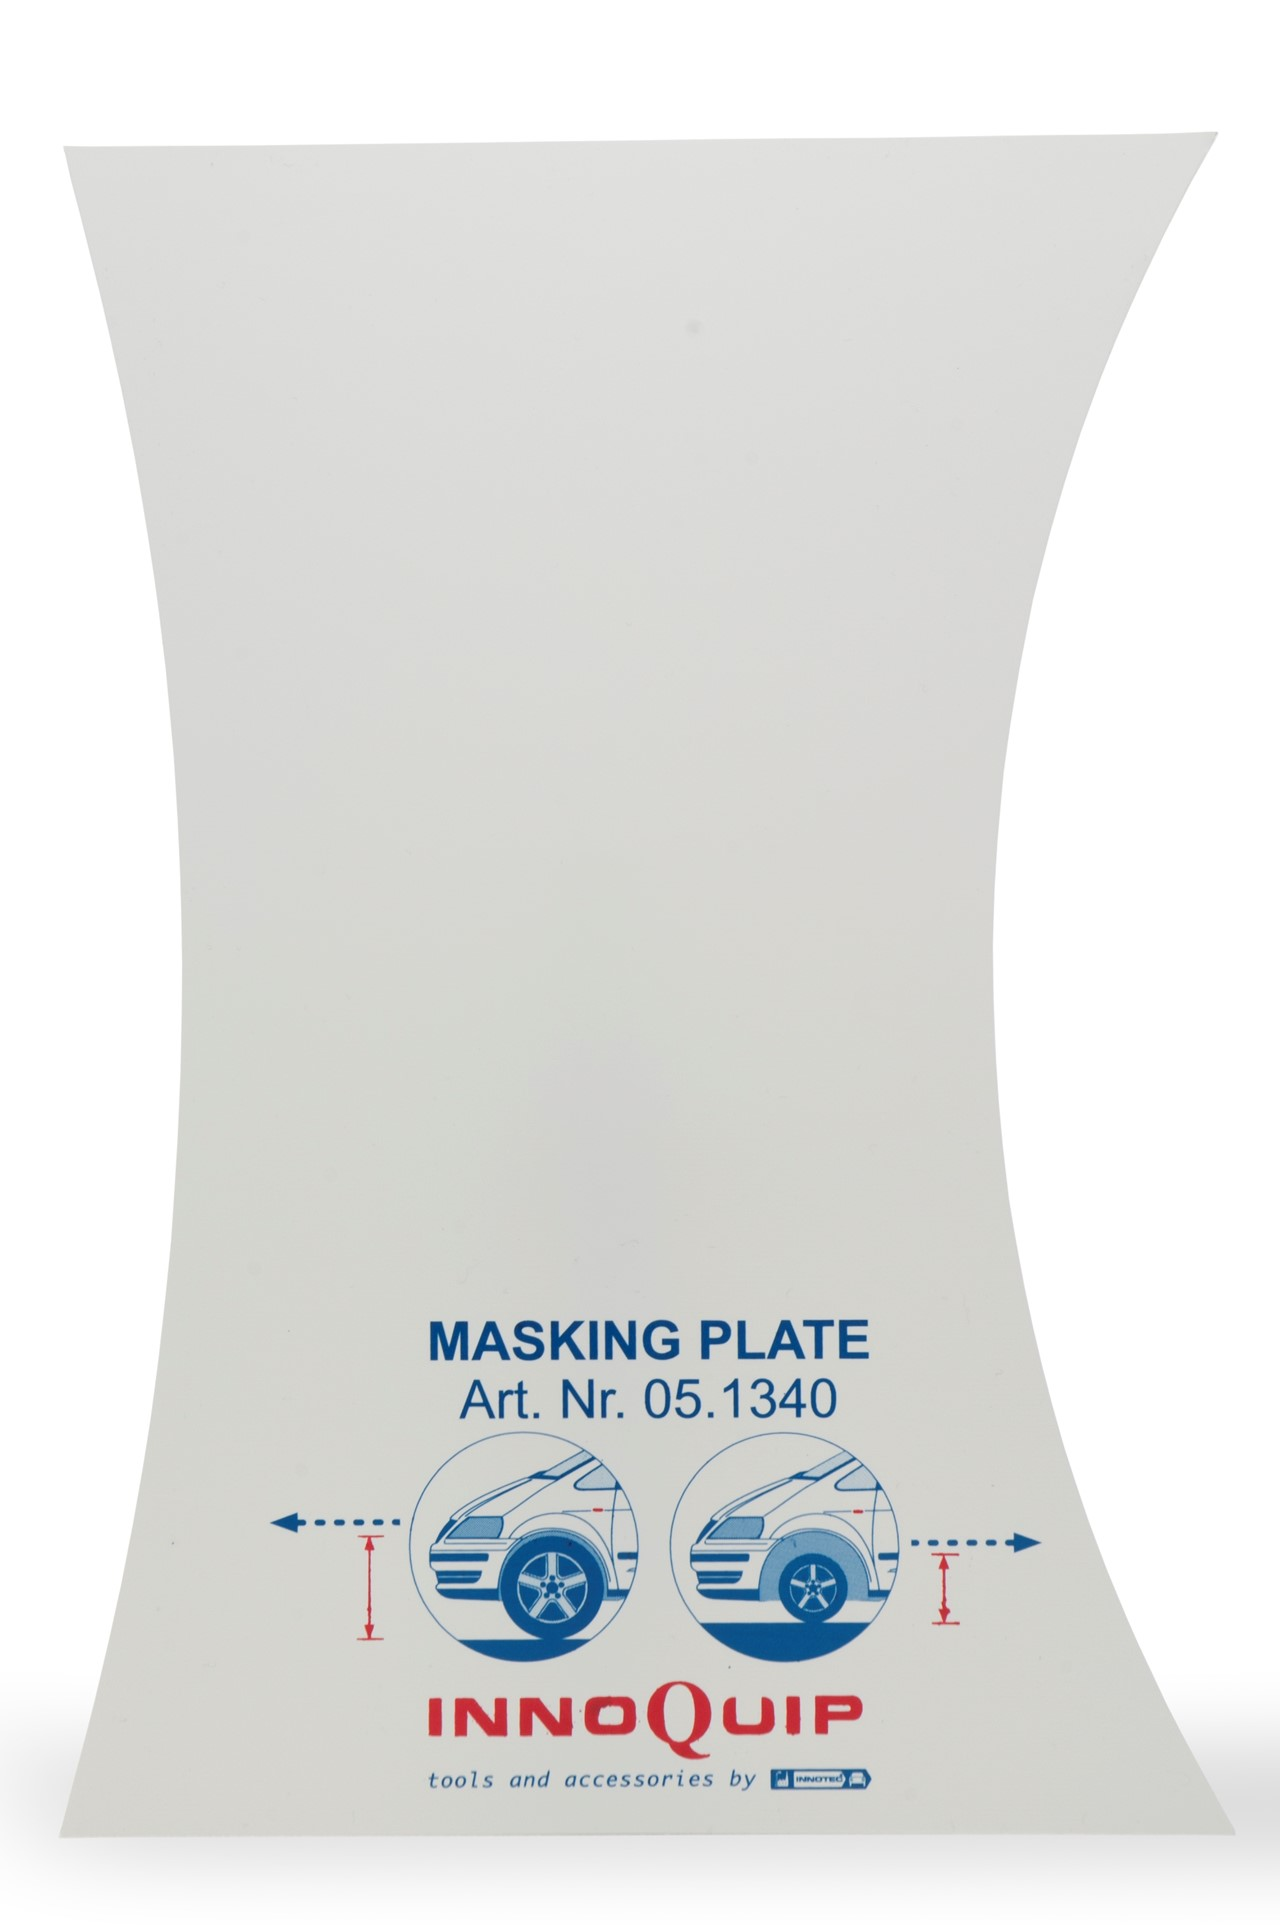 1425_Masking Plate_print.jpg